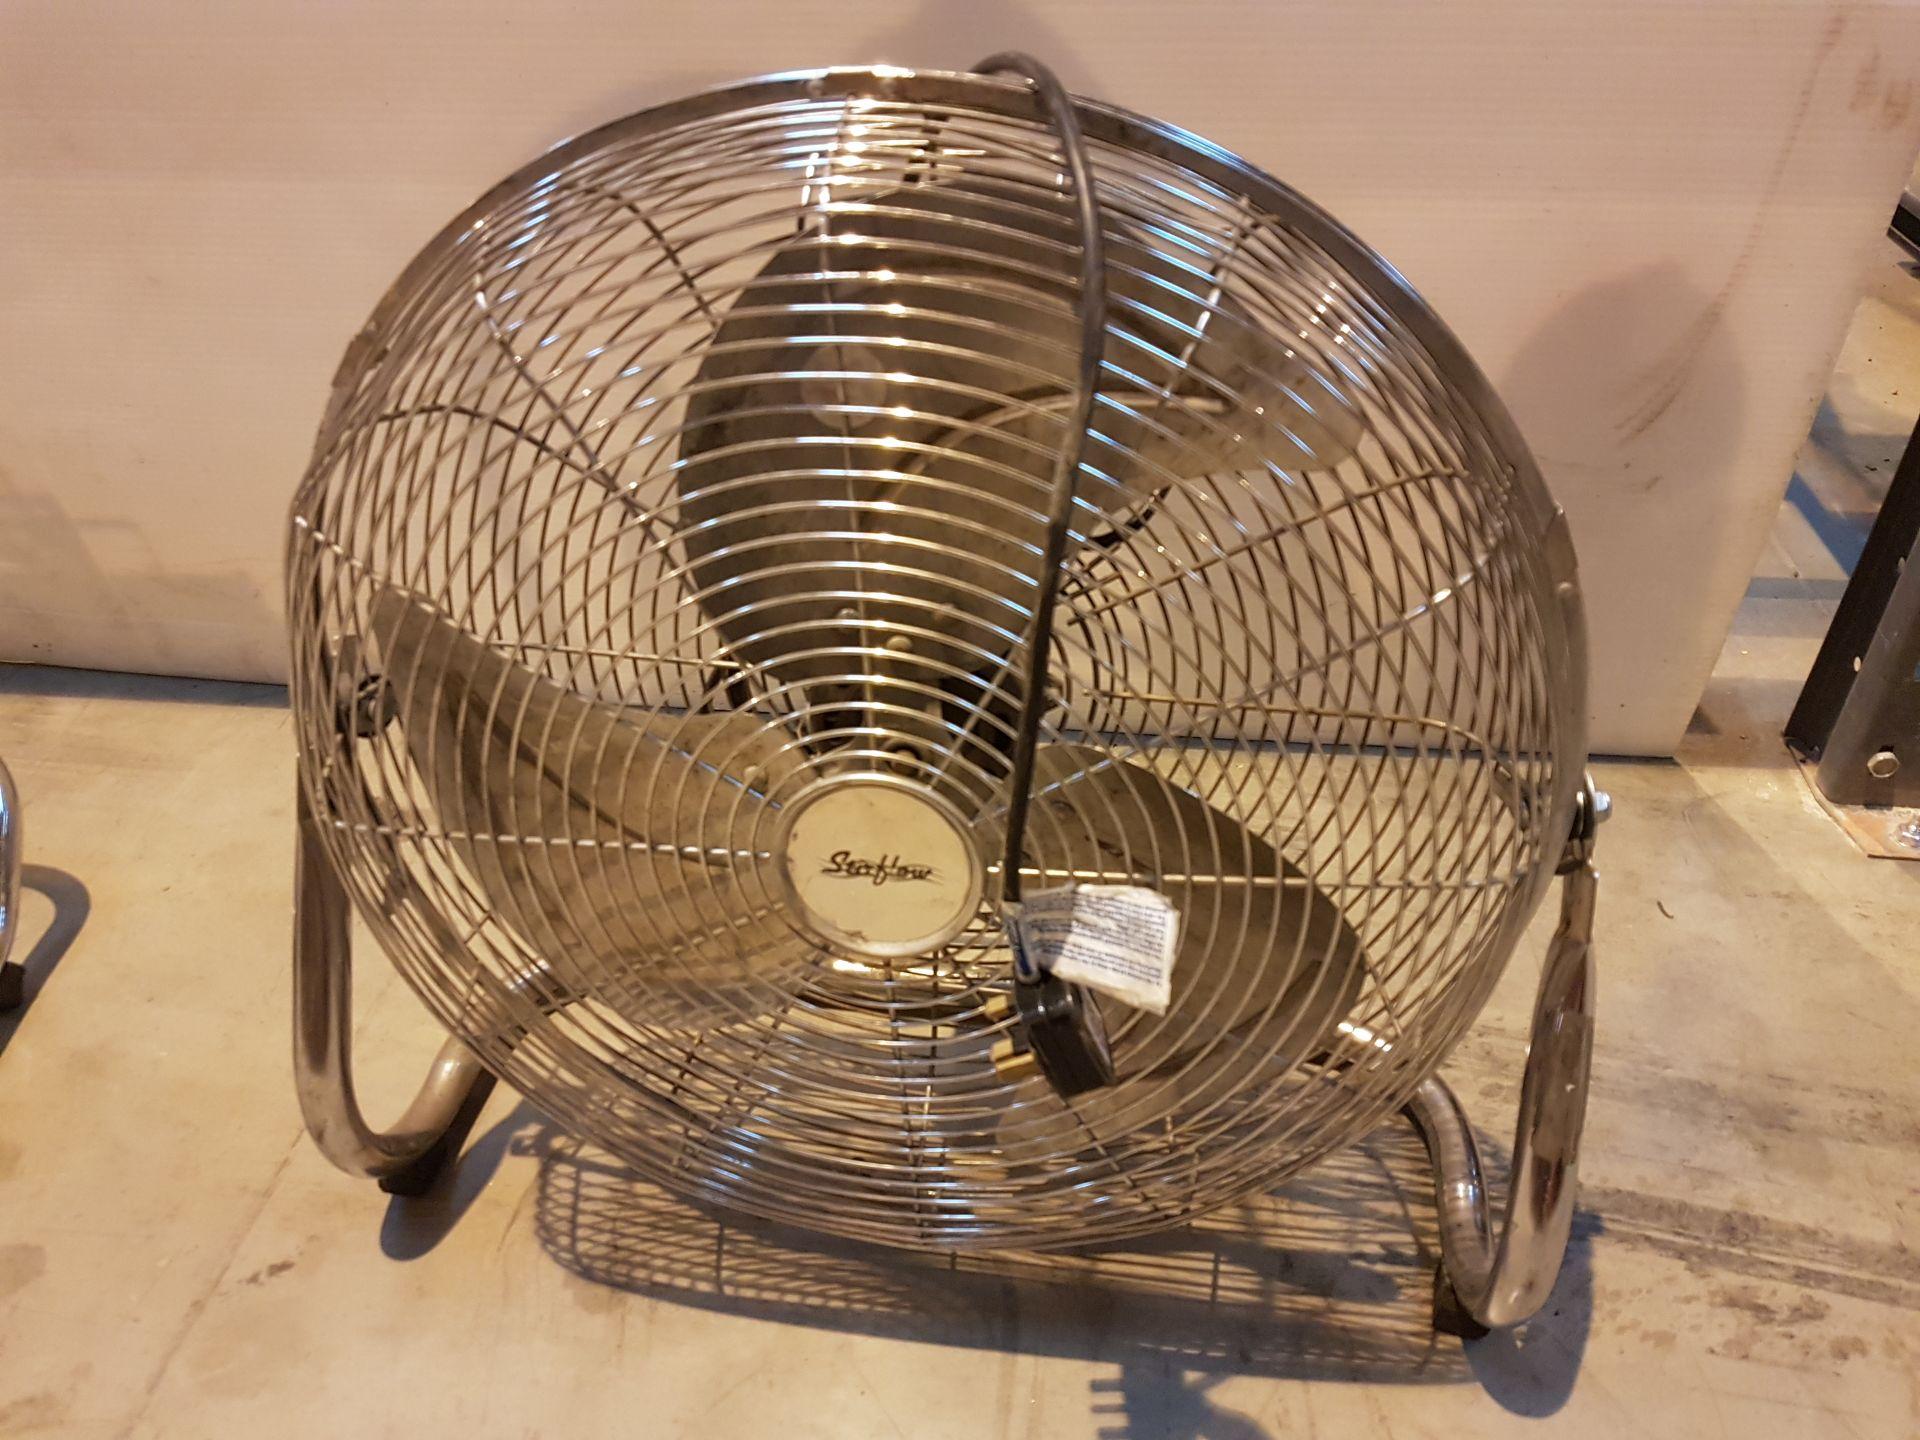 Lot 30 - Pro Elec 240v Oscilating Fan 772H209, working